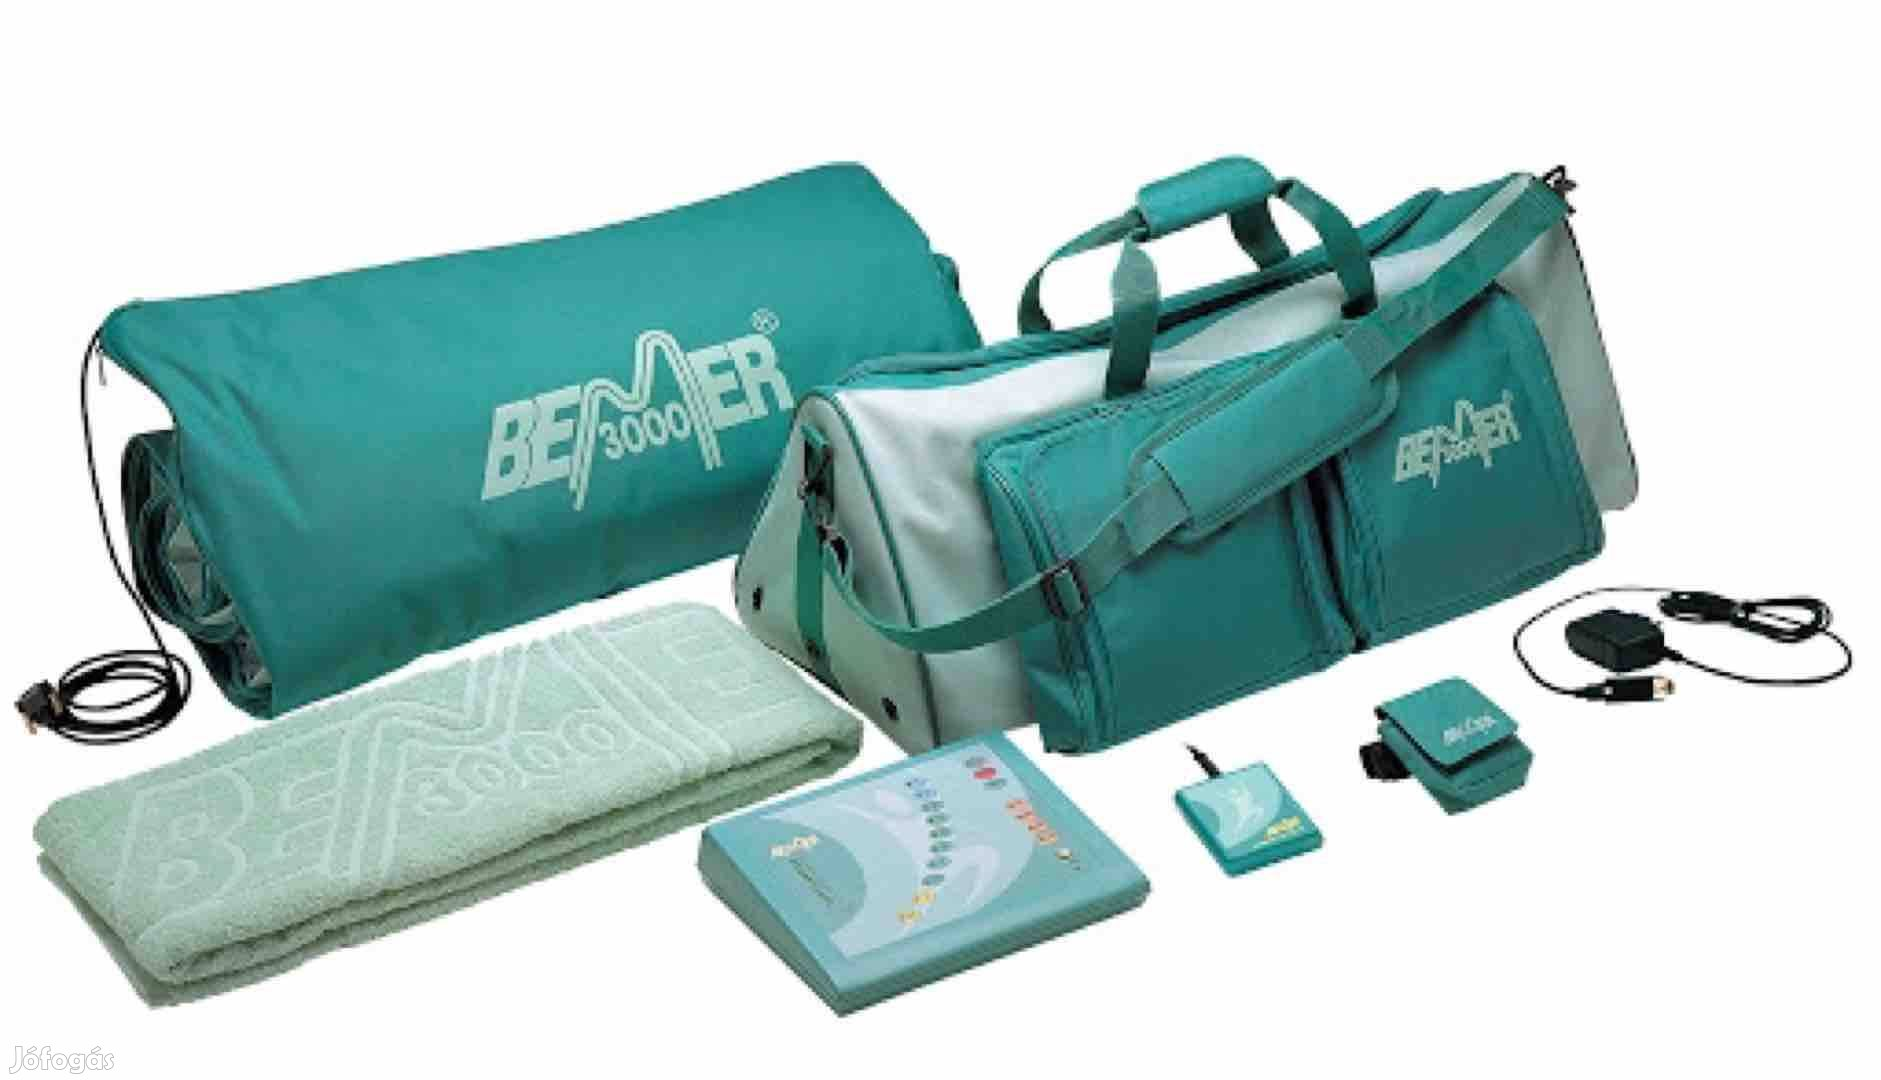 Keresek: BEMER 3000, BEMER Classic,BEMER pro,matrac, bemer professional set